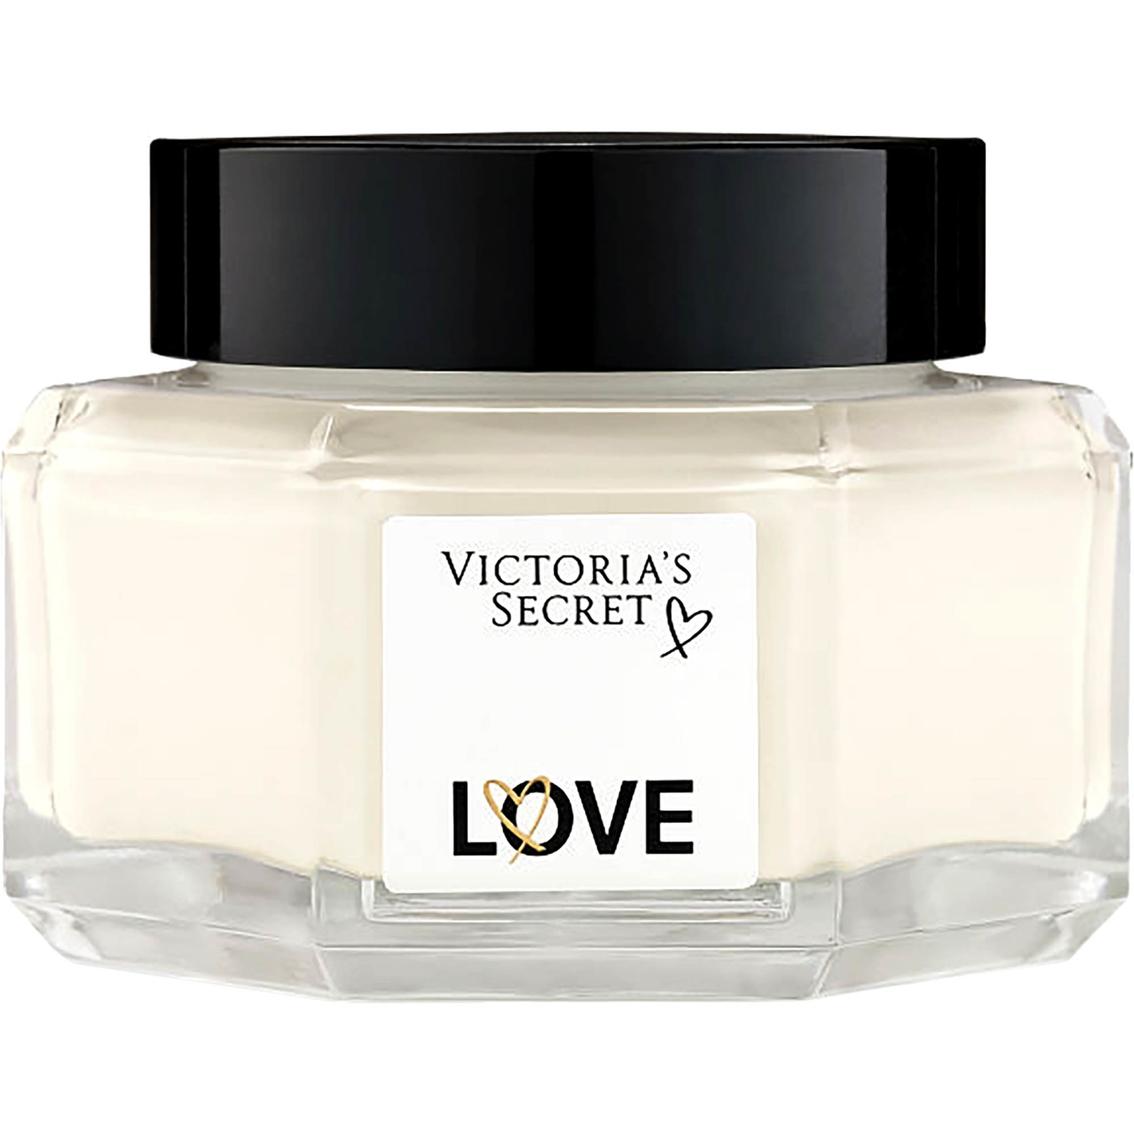 6c8be2784dfde Victoria's Secret Love Fragrance Body Cream | Body Creams | Beauty ...